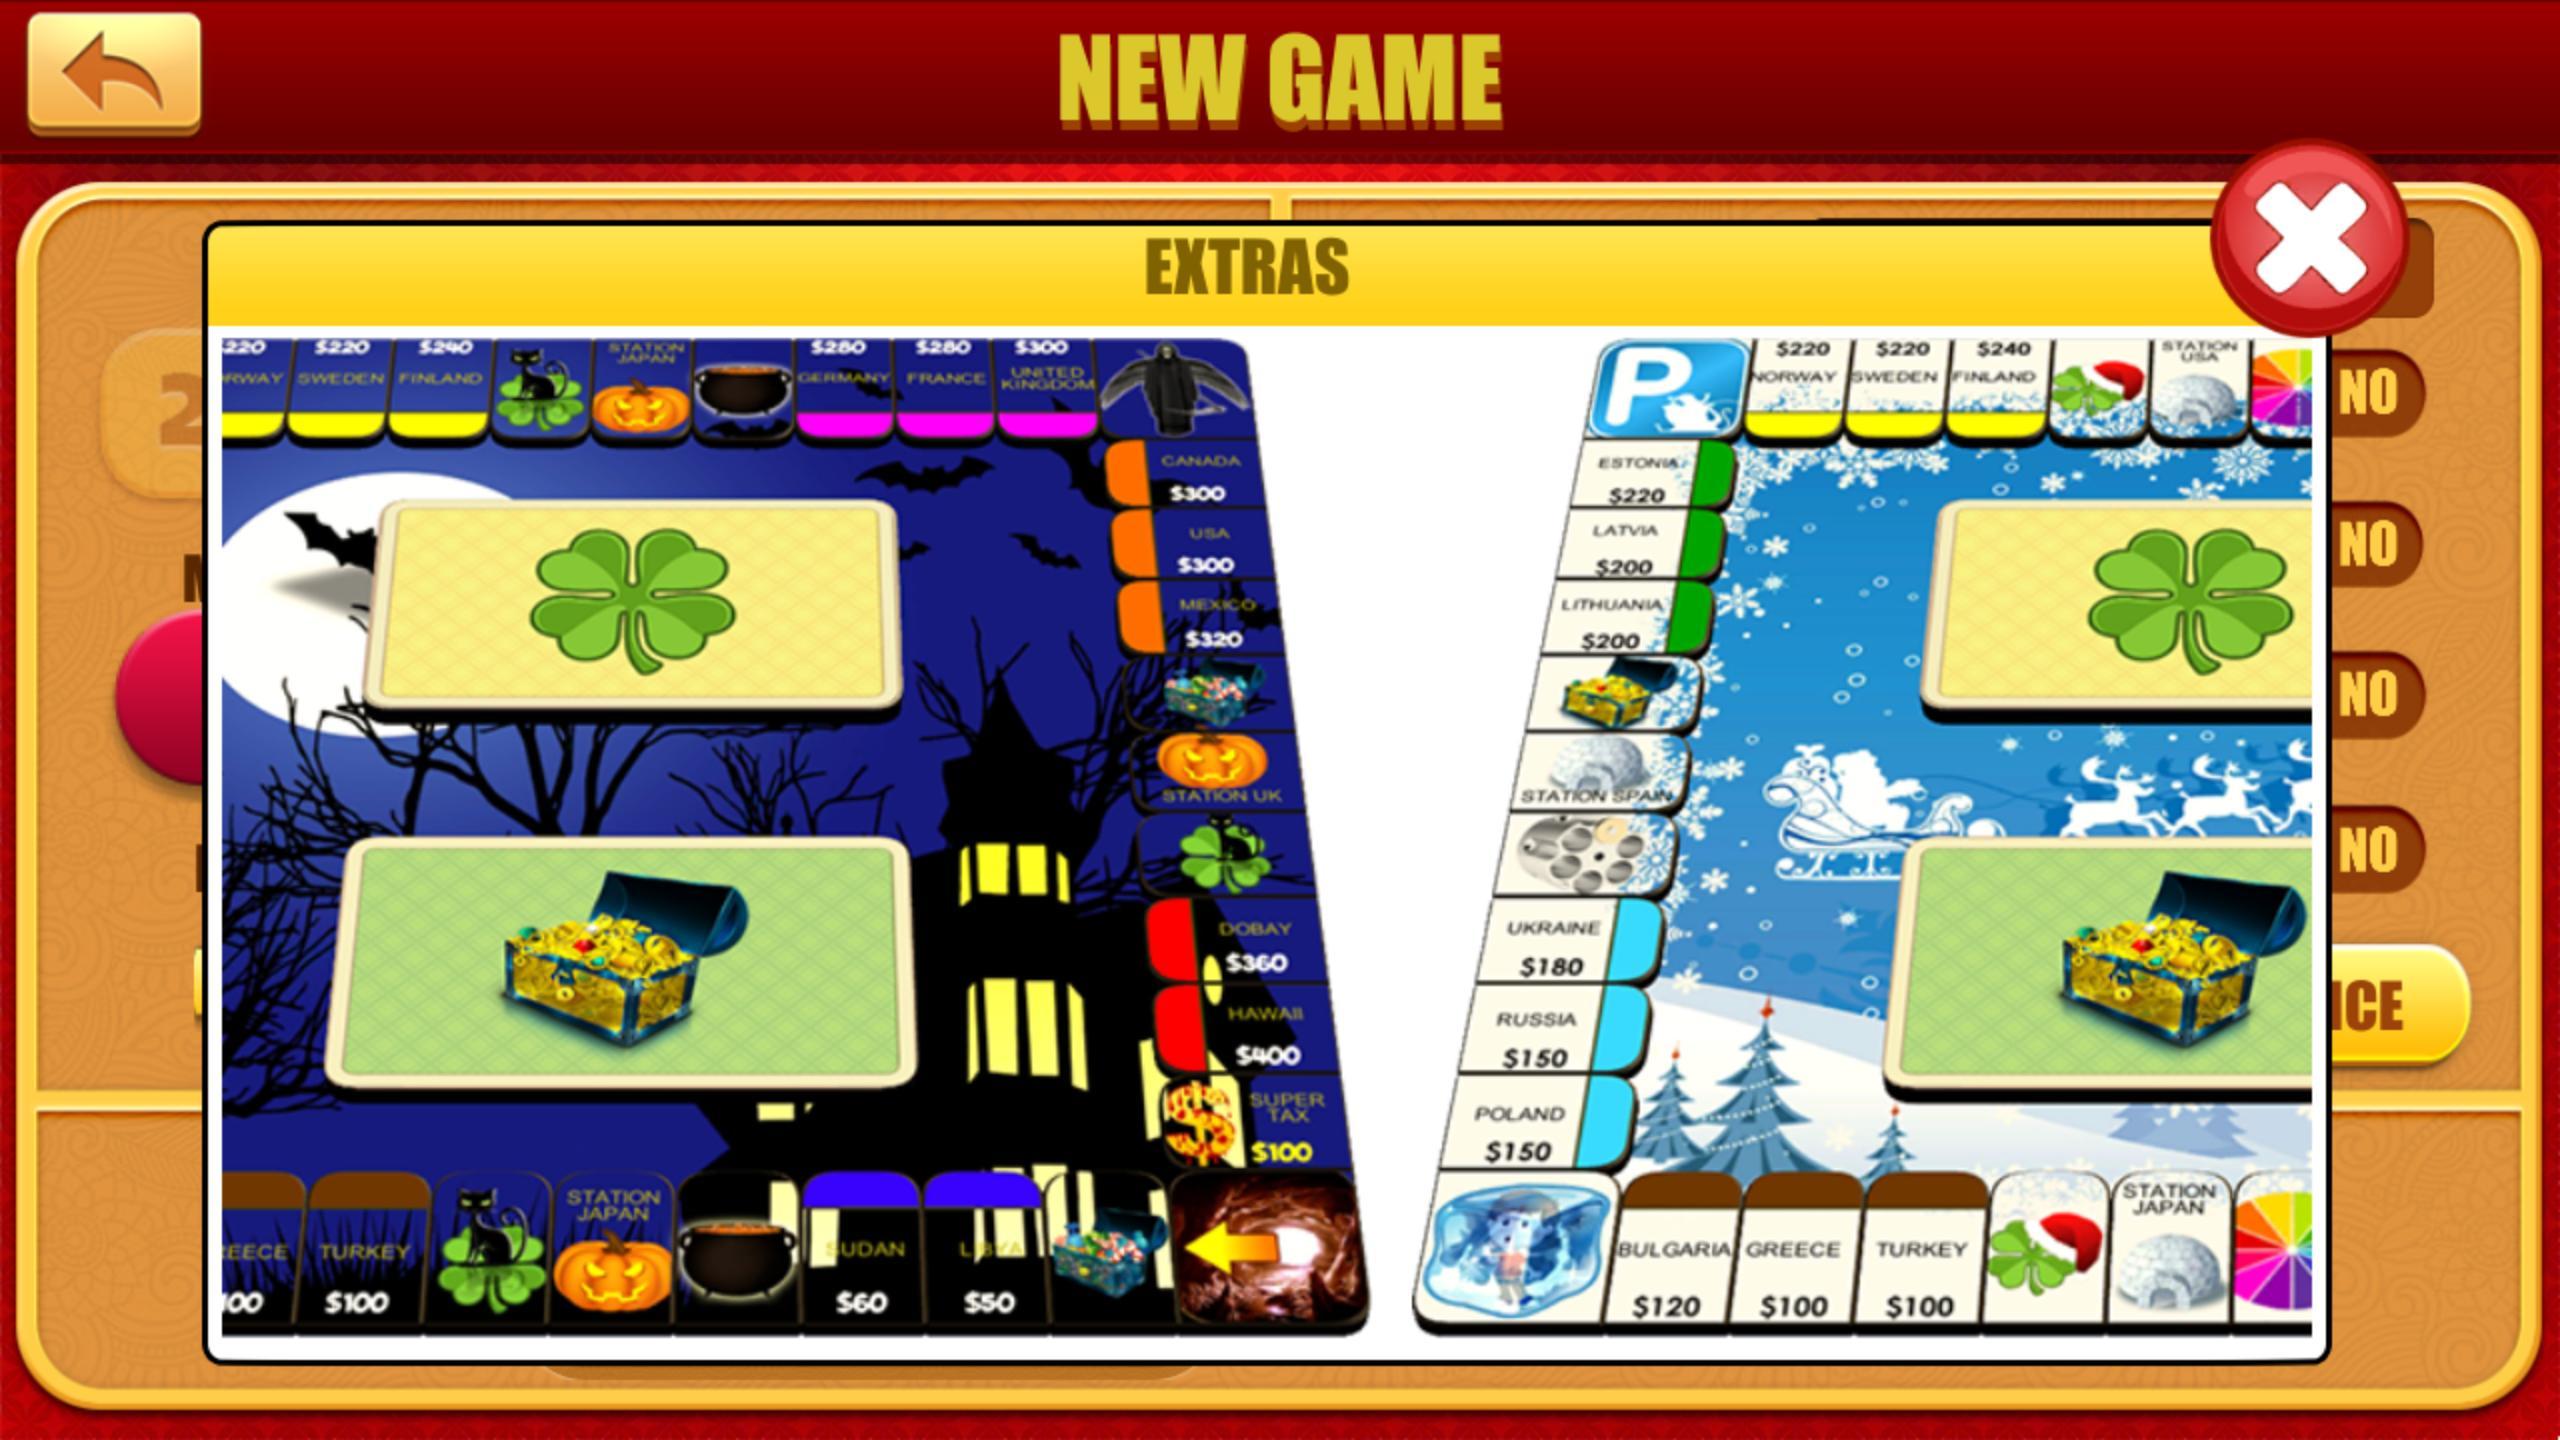 Rento Dice Board Game Online 5.1.9 Screenshot 24